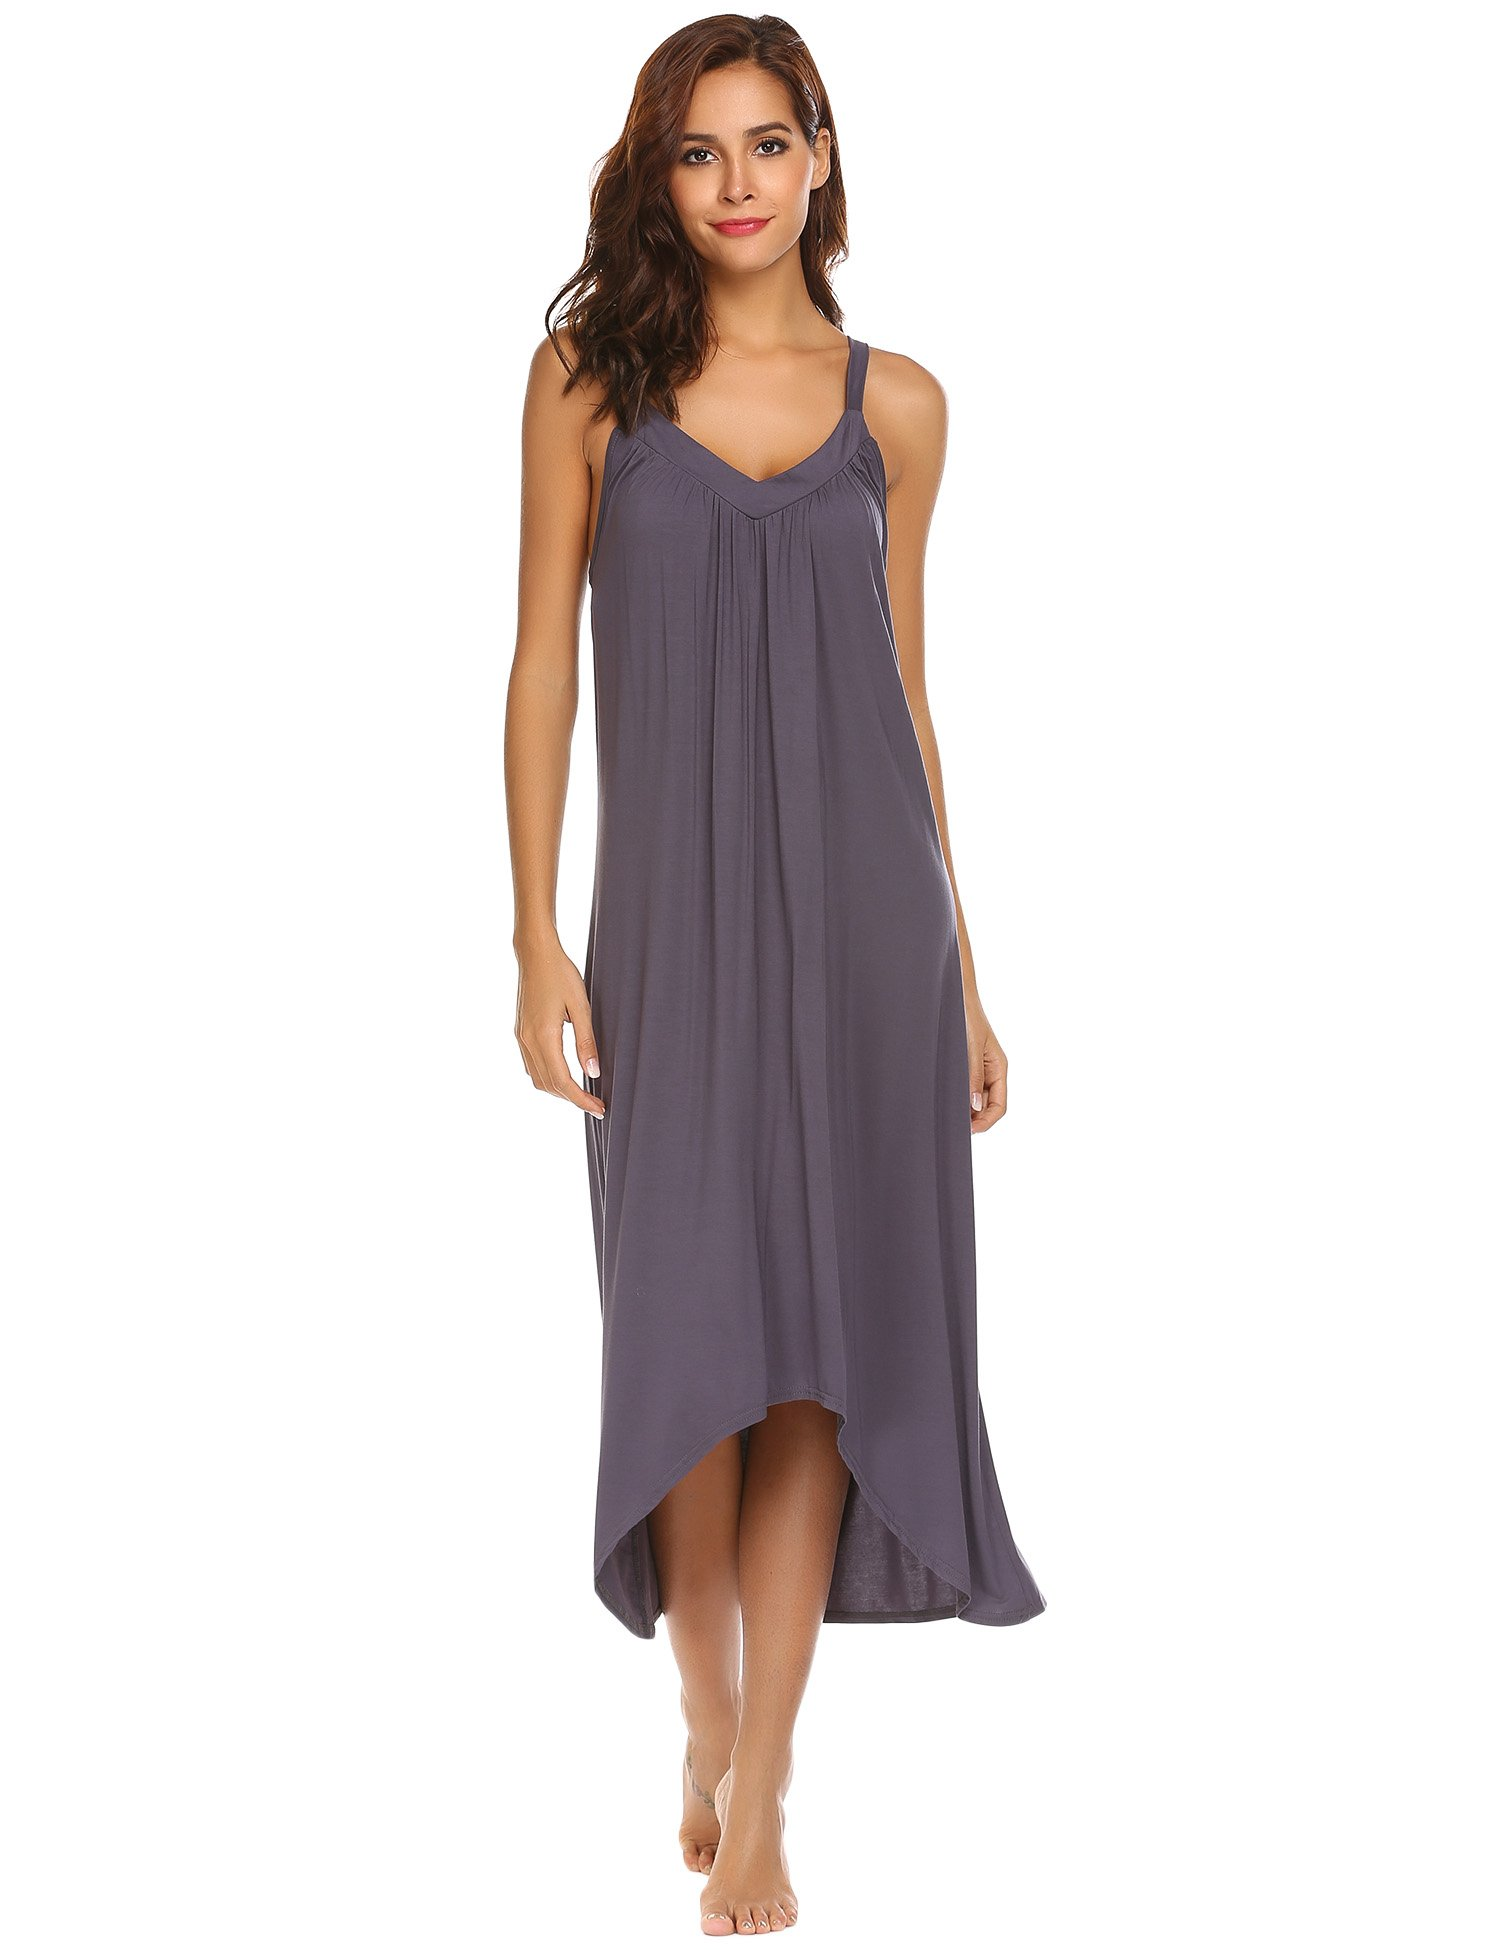 Ekouaer Womens Sleeveless Long Nightgown Summer Slip Night Dress Cotton Sleepshirt Chemise,A-dark Grey_6696,Small